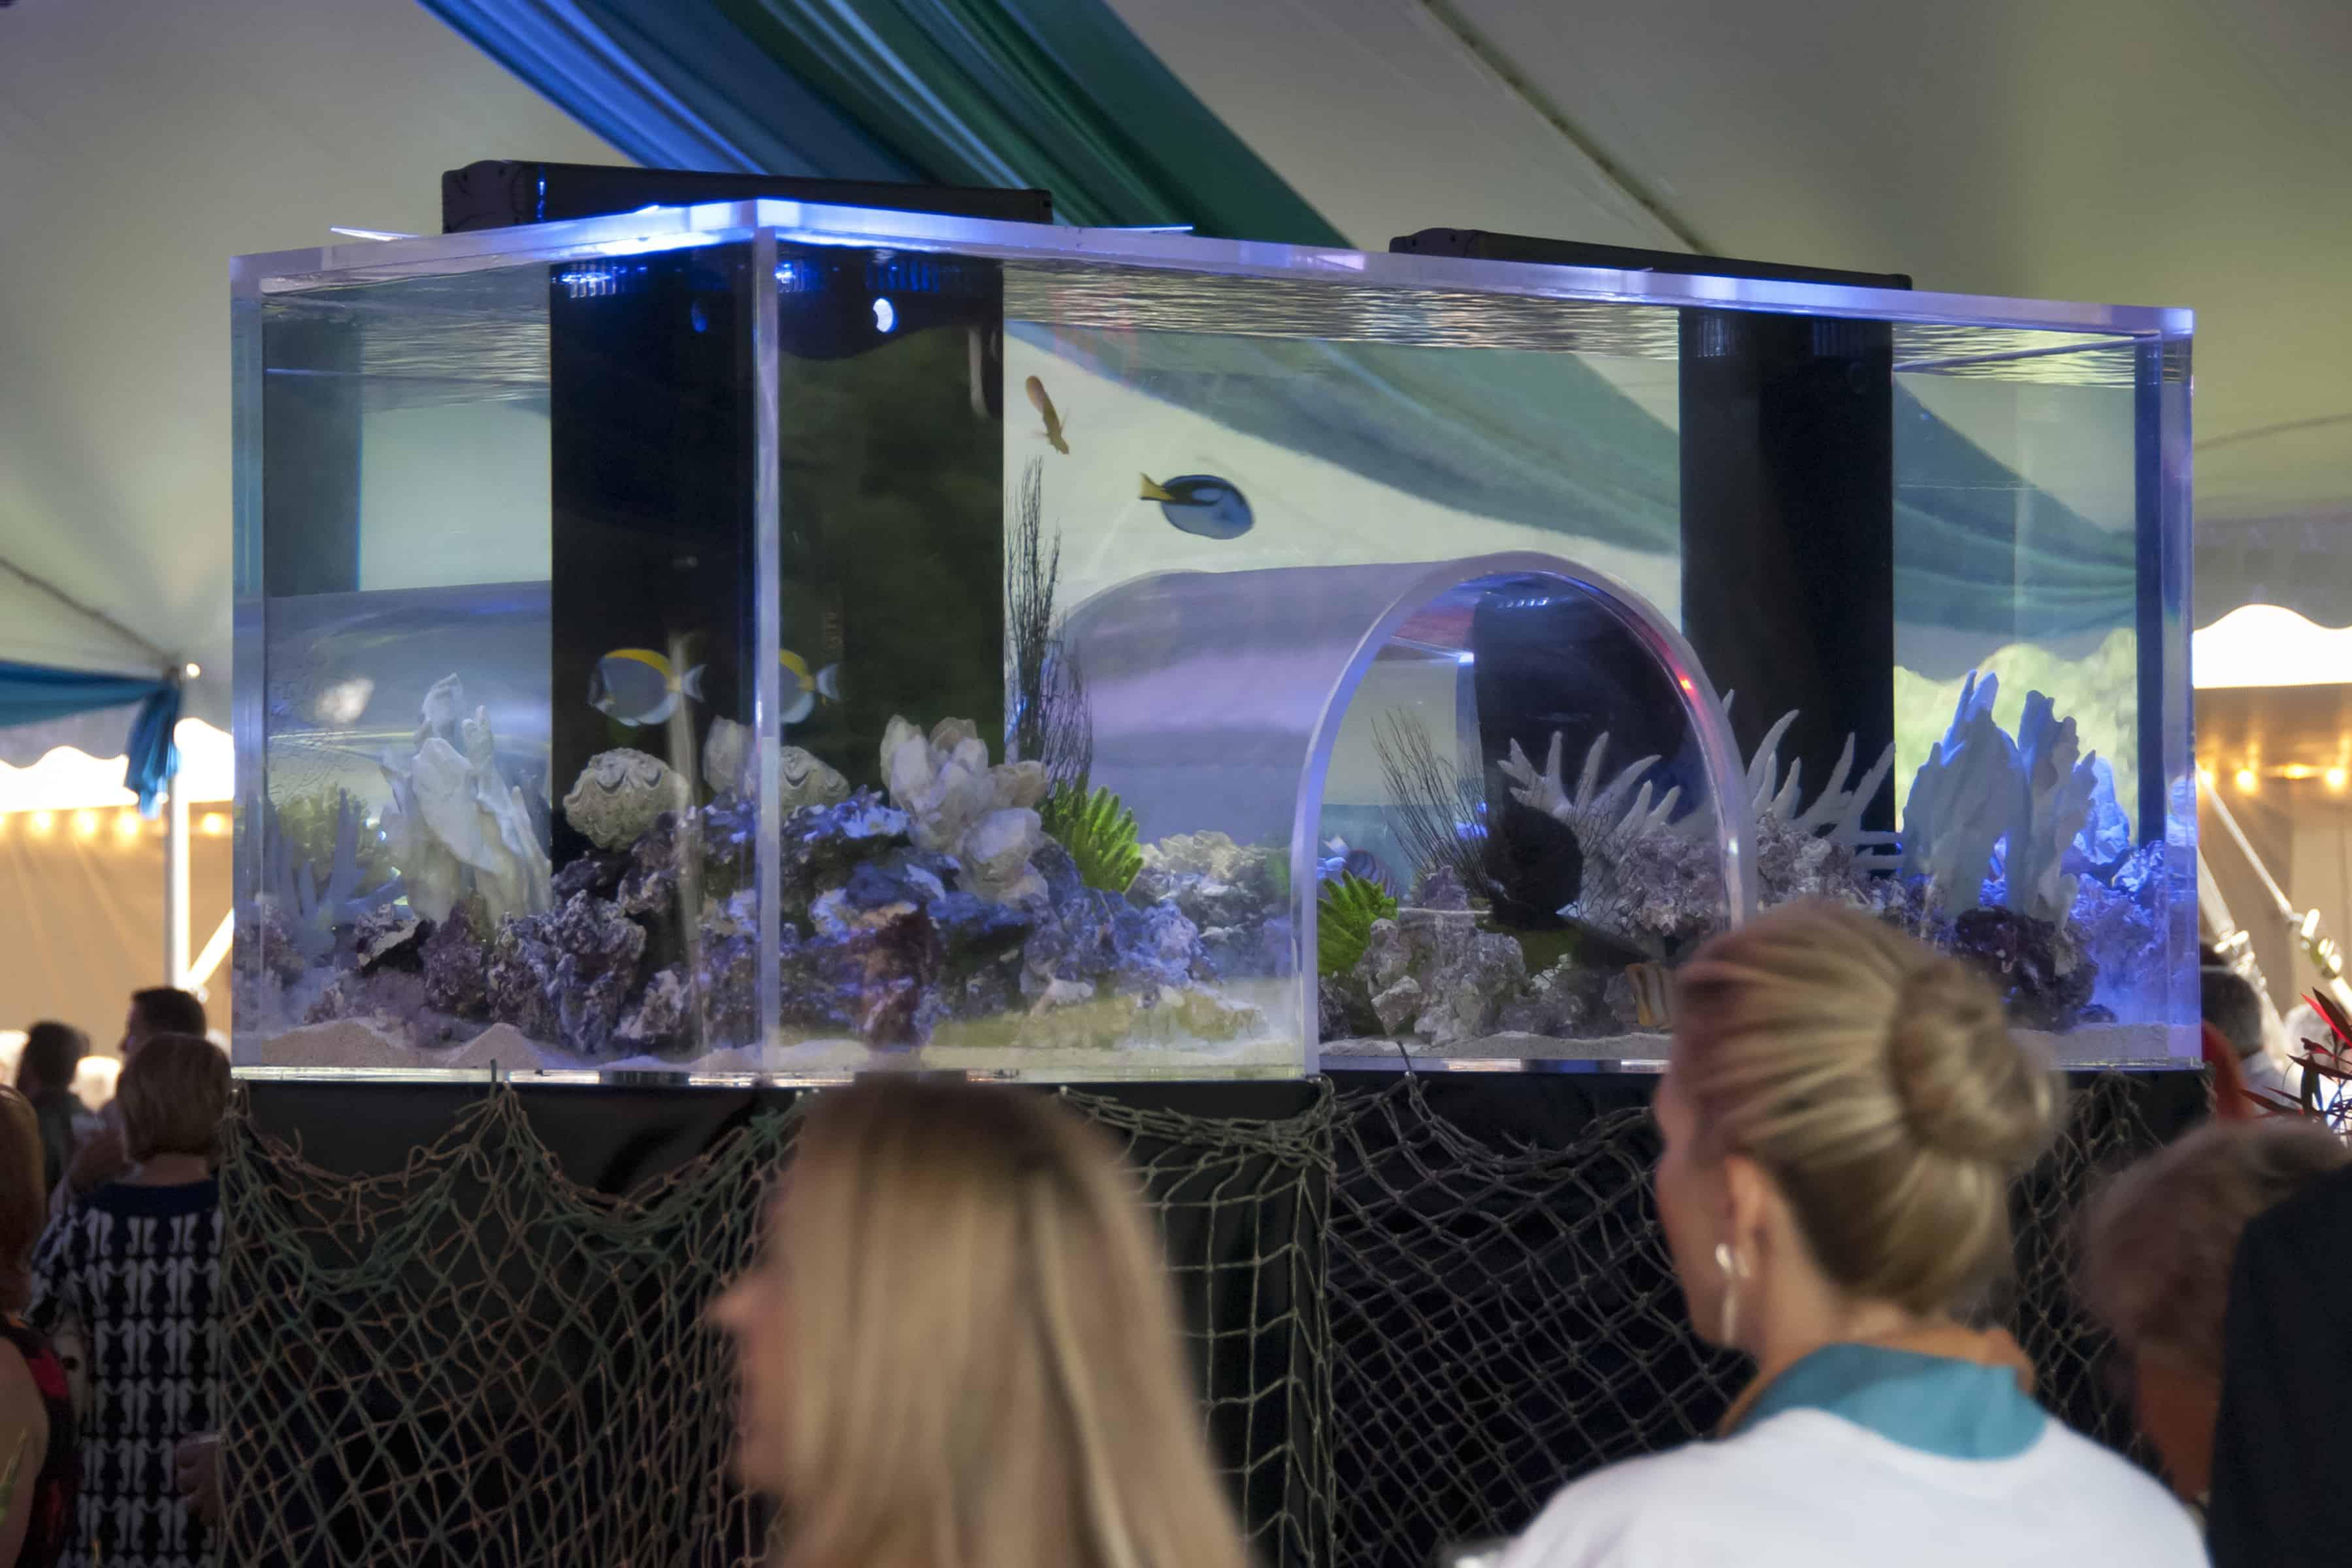 Aquarium Store Near Clifton Park Ny Aquarium Store Near